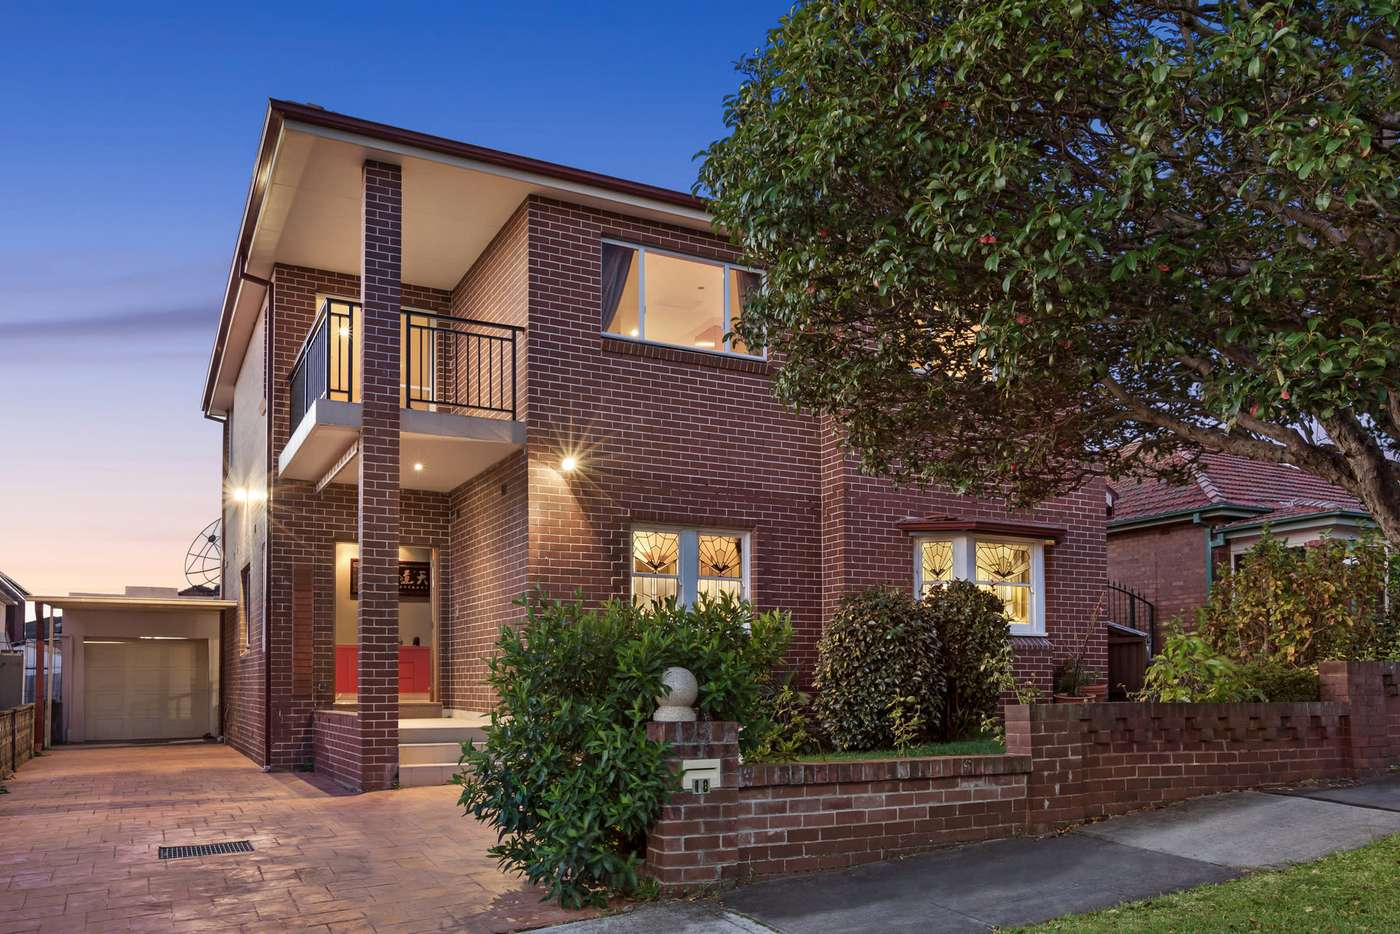 Main view of Homely house listing, 18 Gartfern Avenue, Wareemba NSW 2046